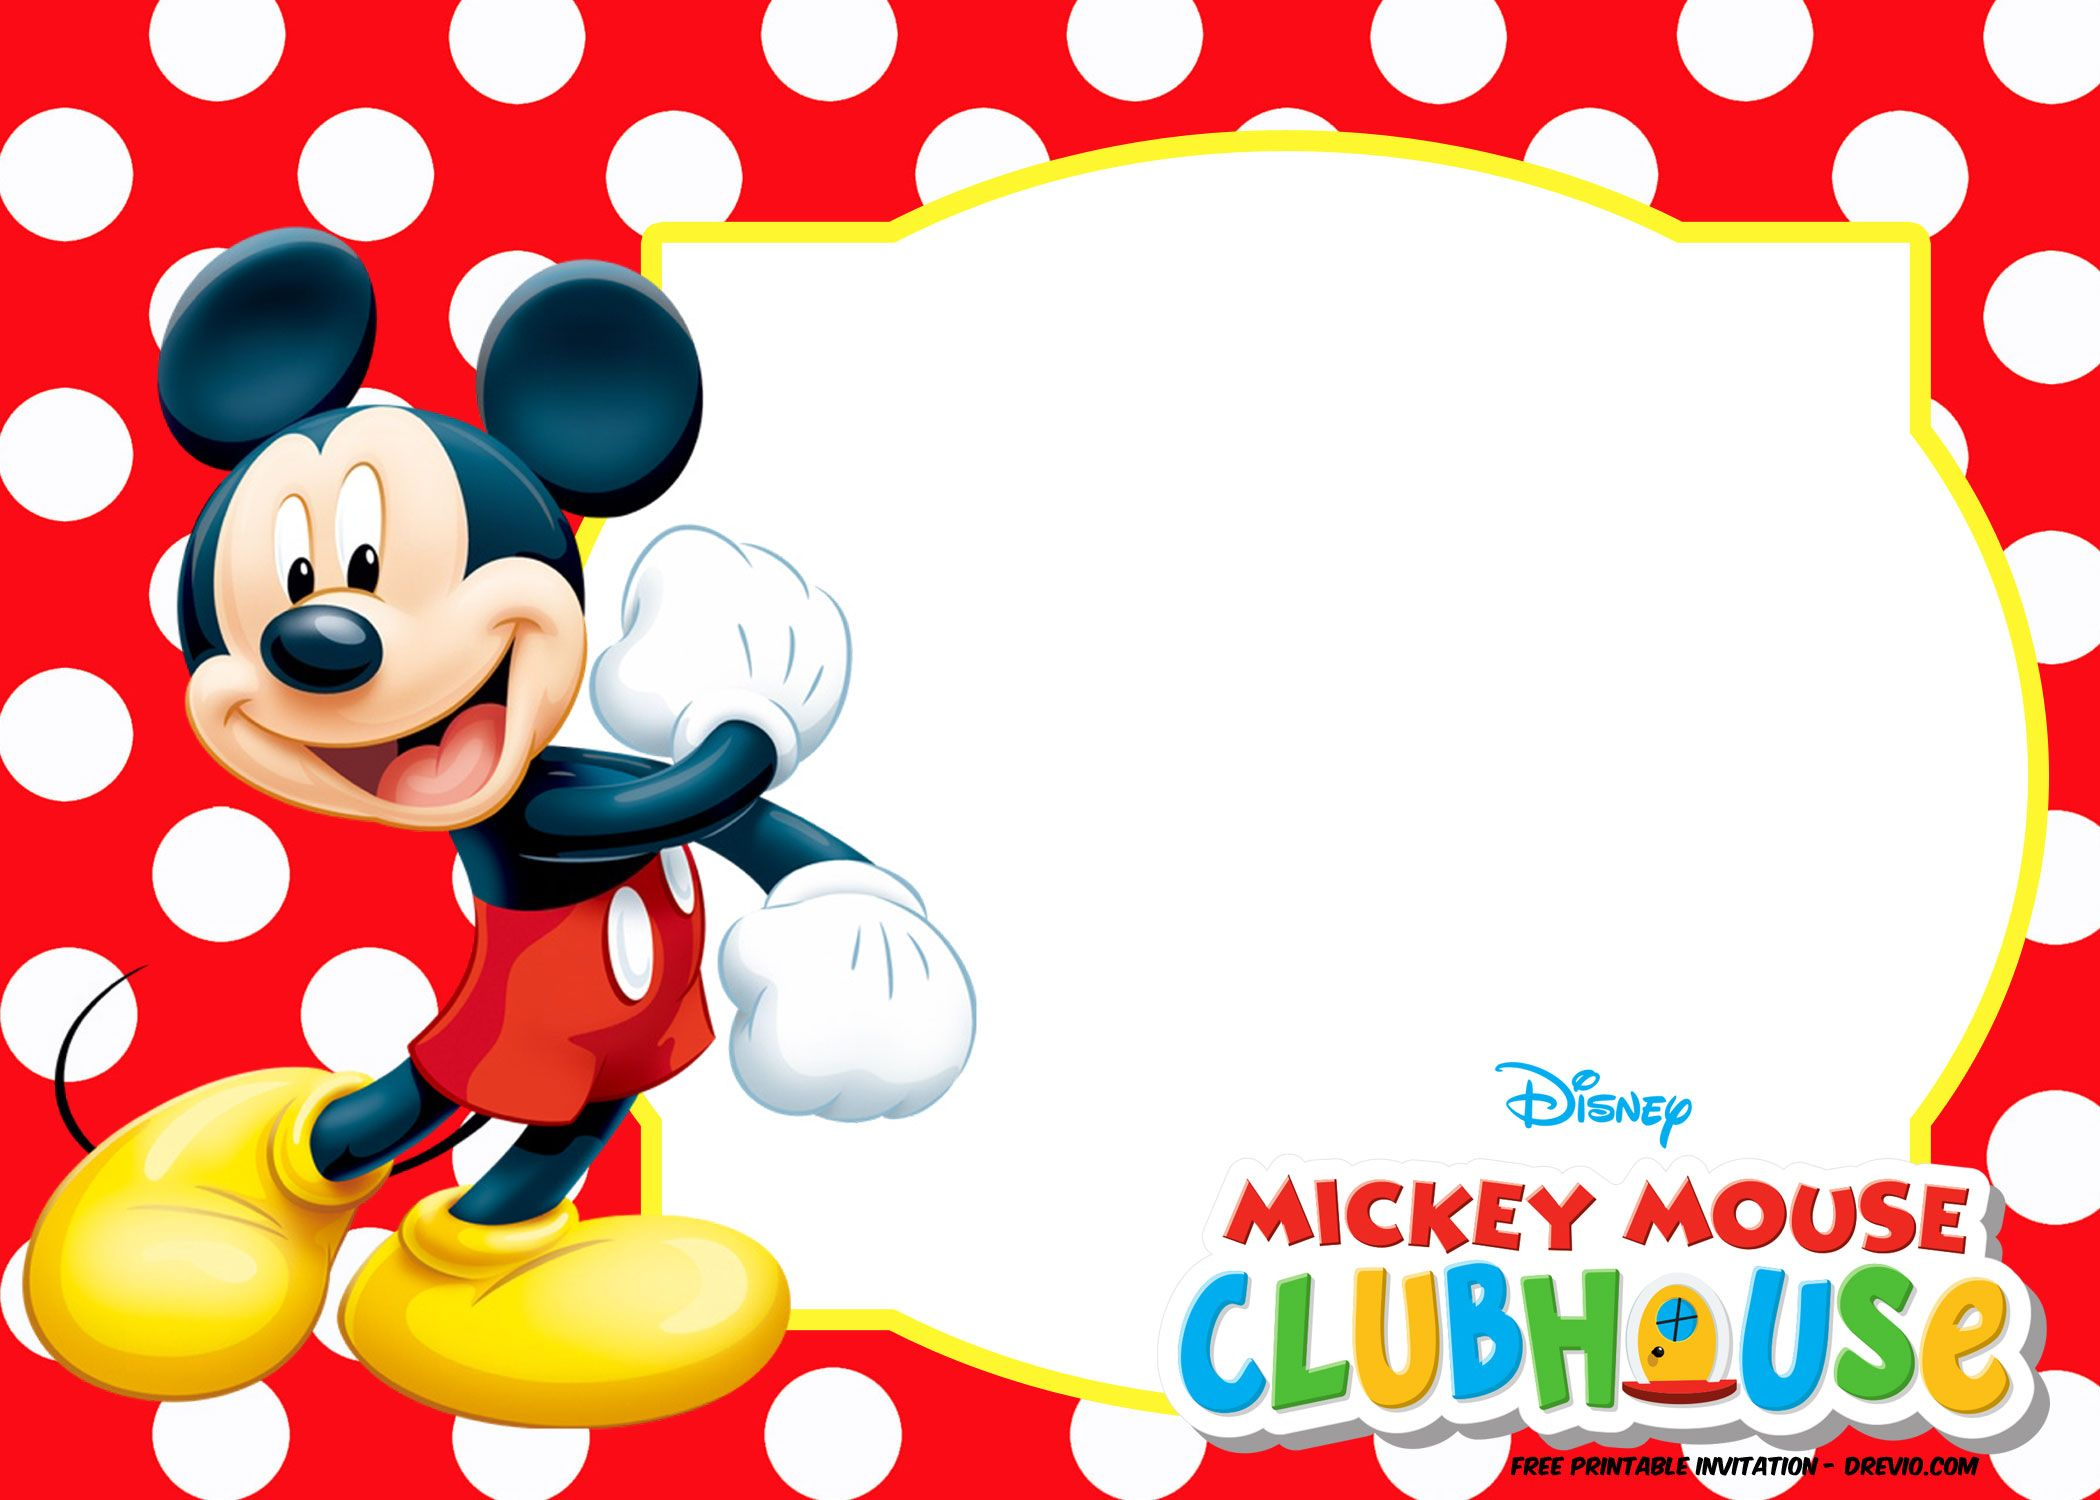 Mickey Mouse Polka Dot Invitation Templates Mickey mouse